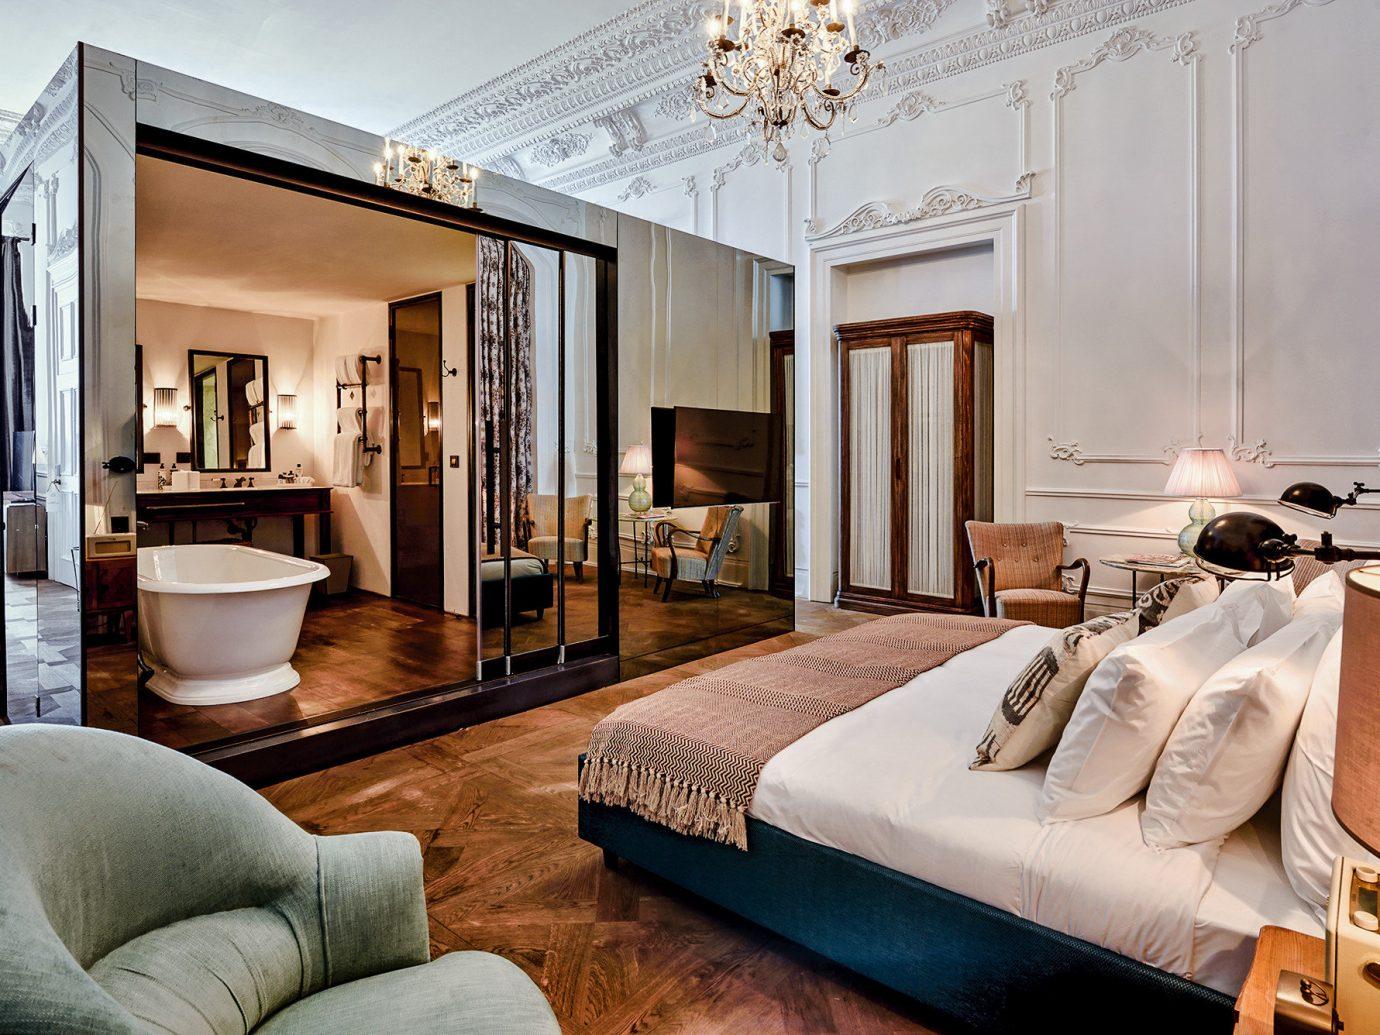 Boutique Hotels Hotels Luxury Travel indoor sofa Living room interior design Suite ceiling living room real estate Bedroom furniture interior designer penthouse apartment decorated